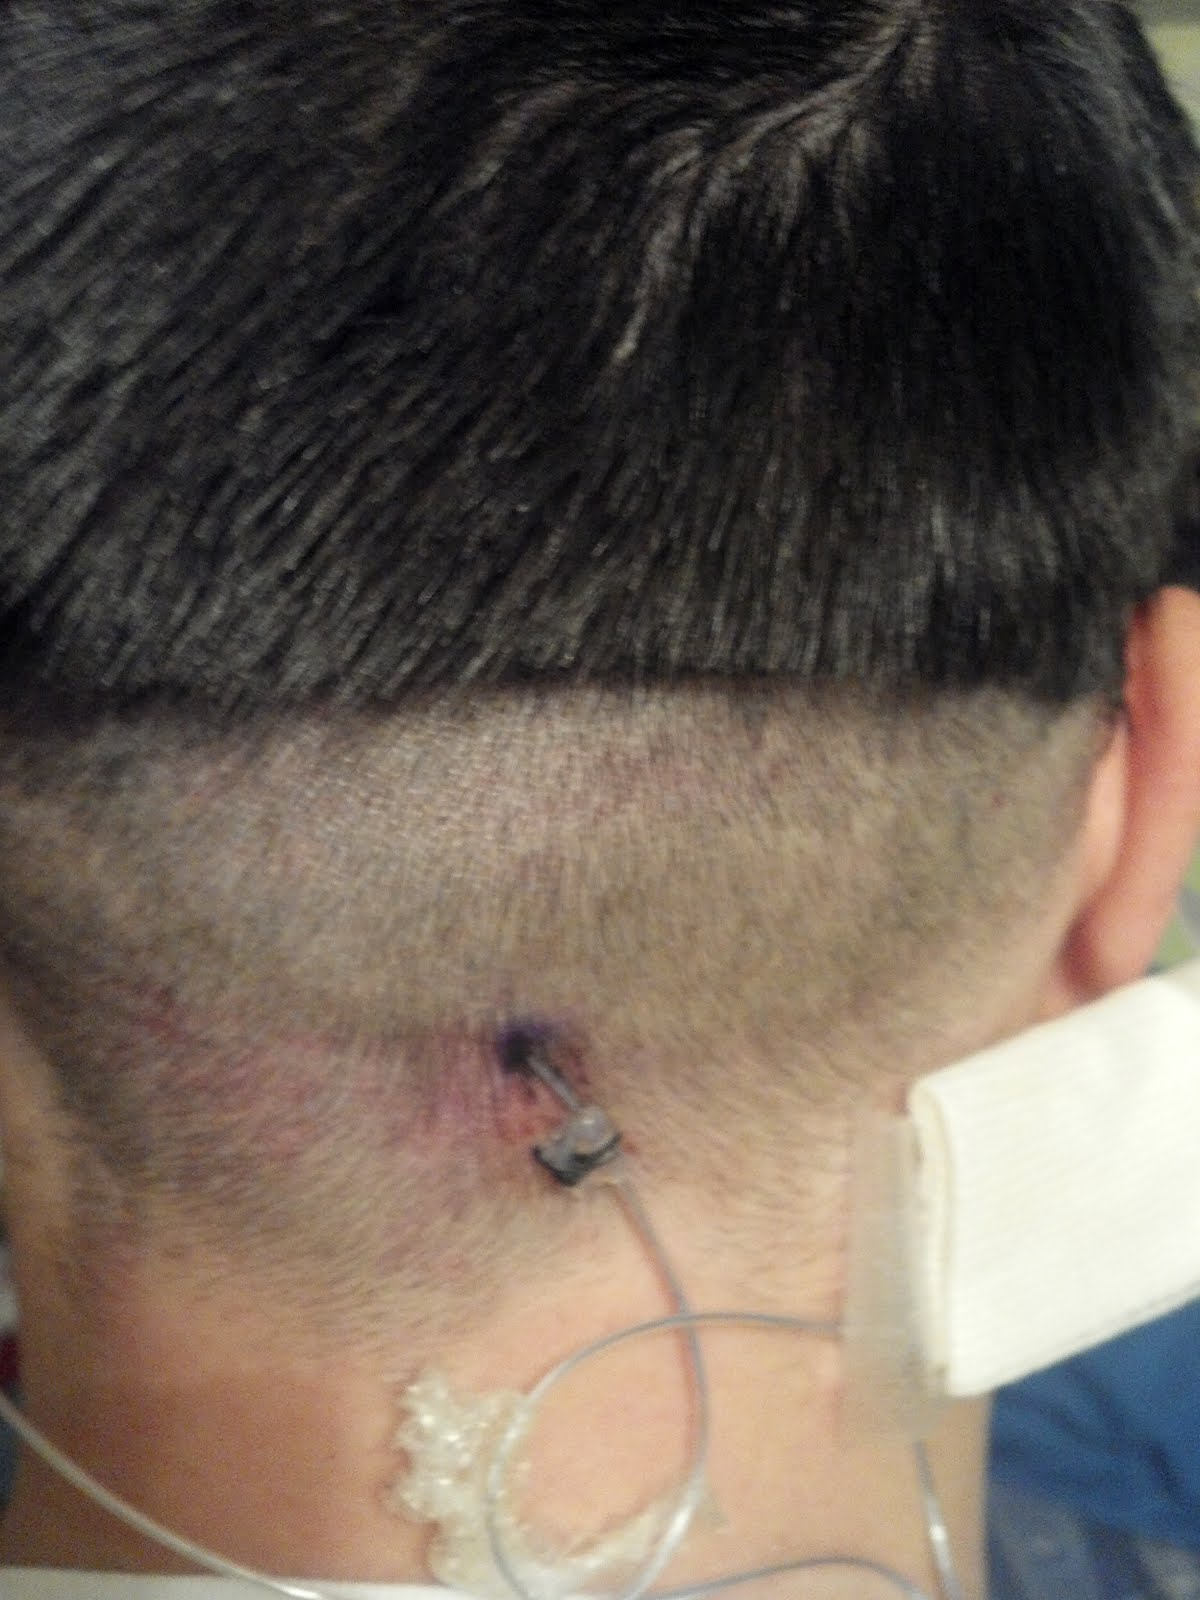 Back Nerve Stimulator And Had a Nerve Stimulator